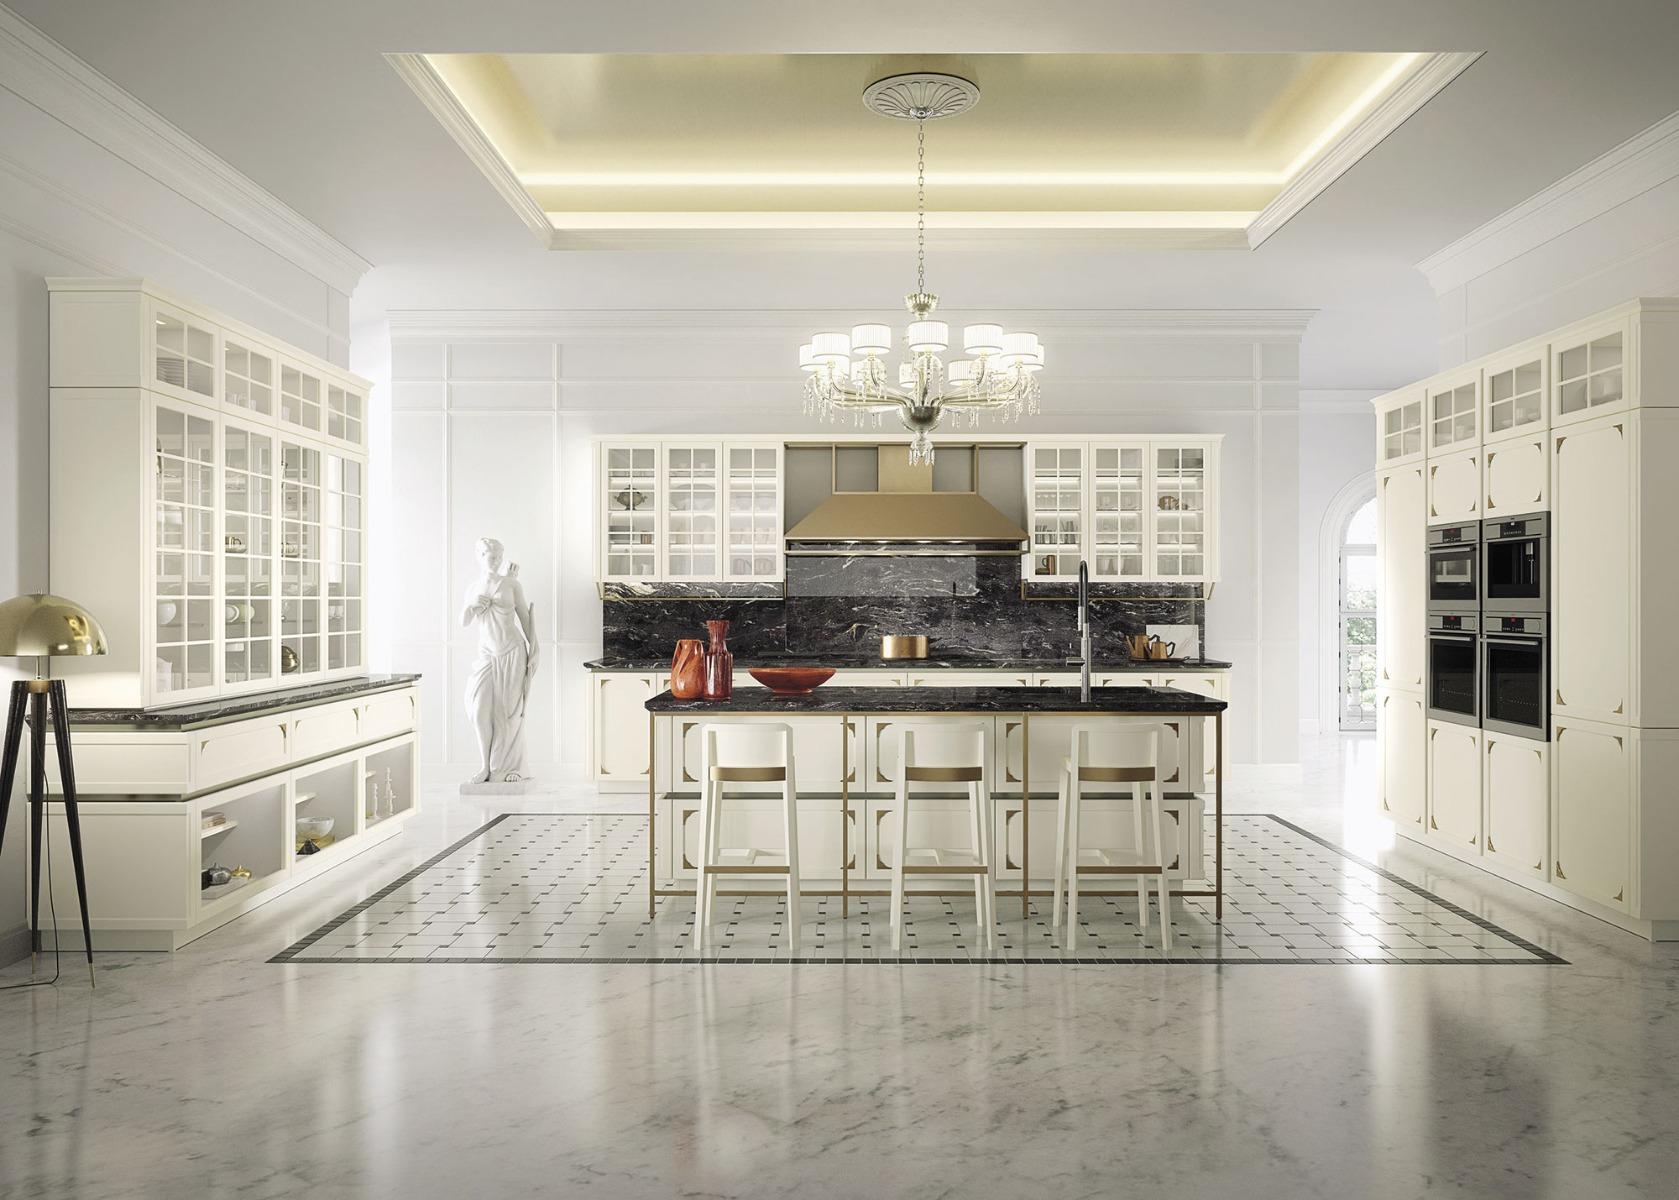 Cucina Sanidero Kelly, cucina classica chic